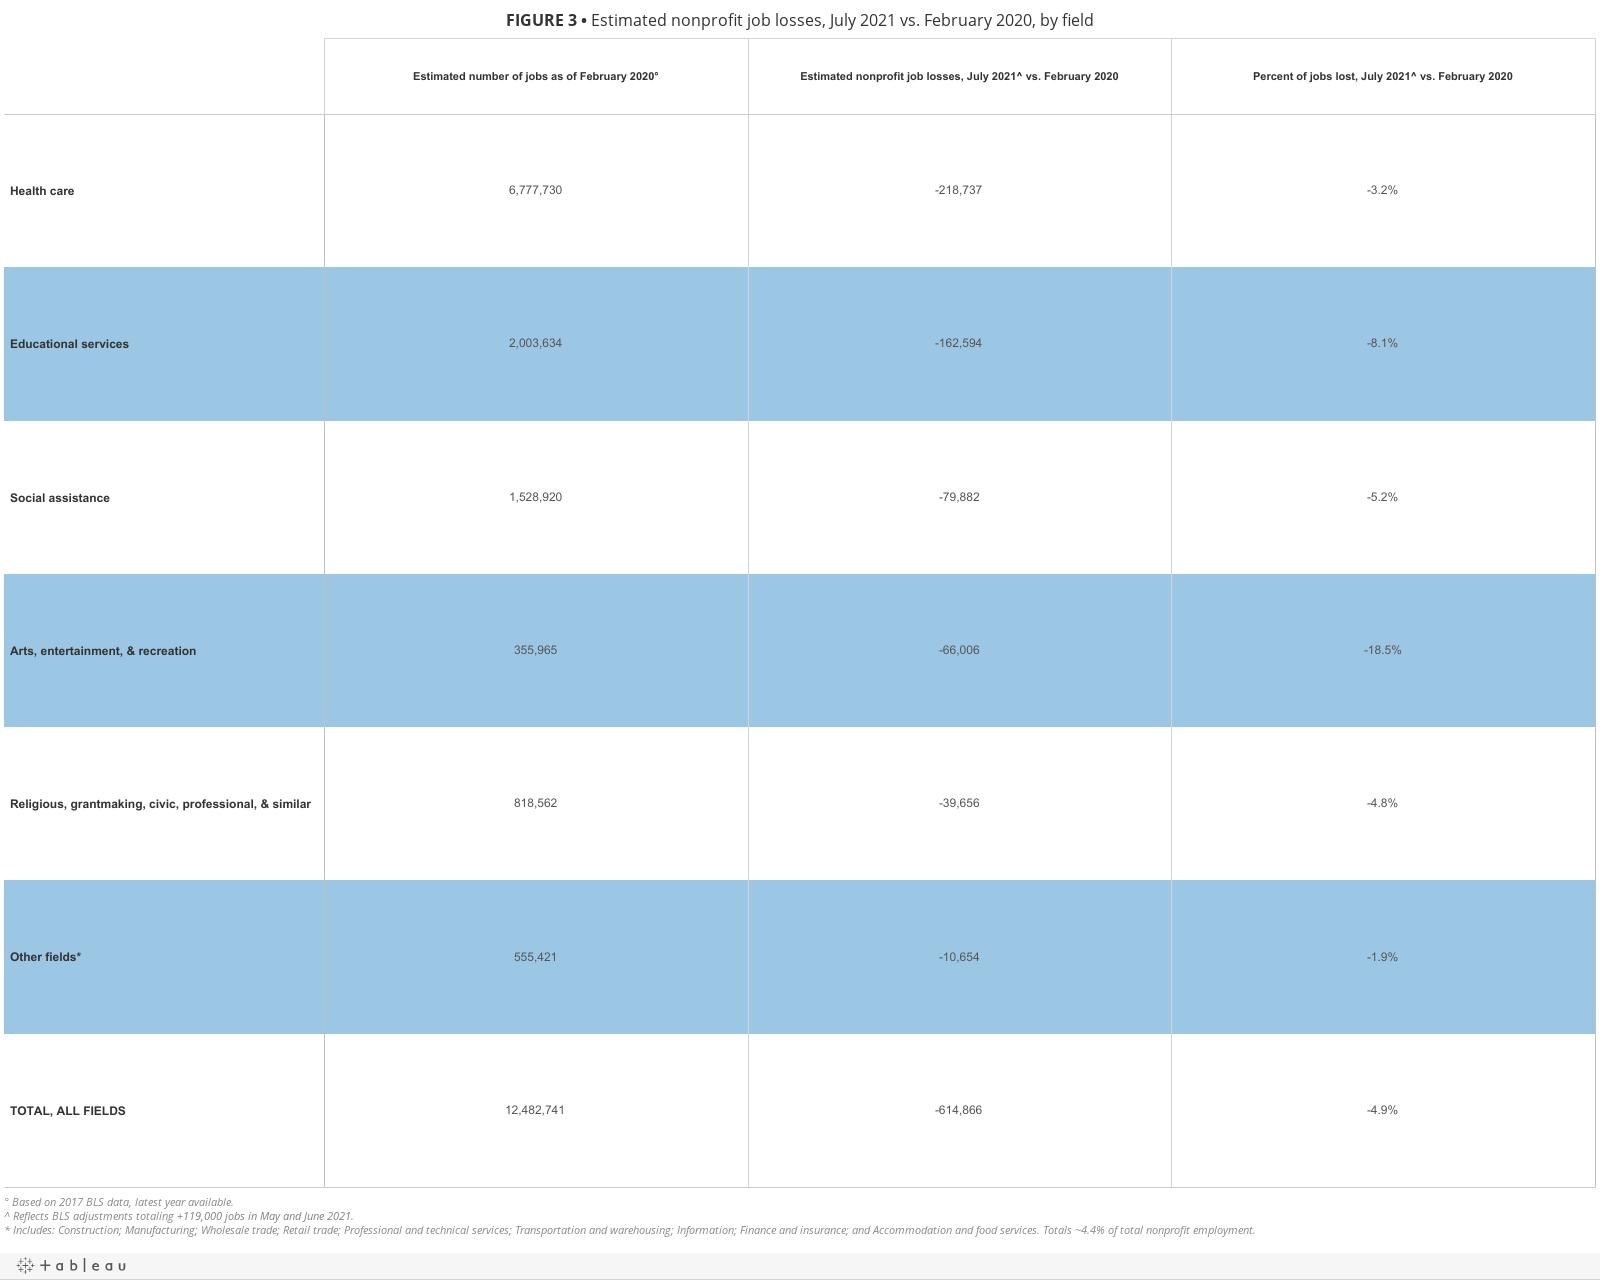 FIGURE 3• Estimated nonprofit job losses, July 2021 vs. February 2020, by field